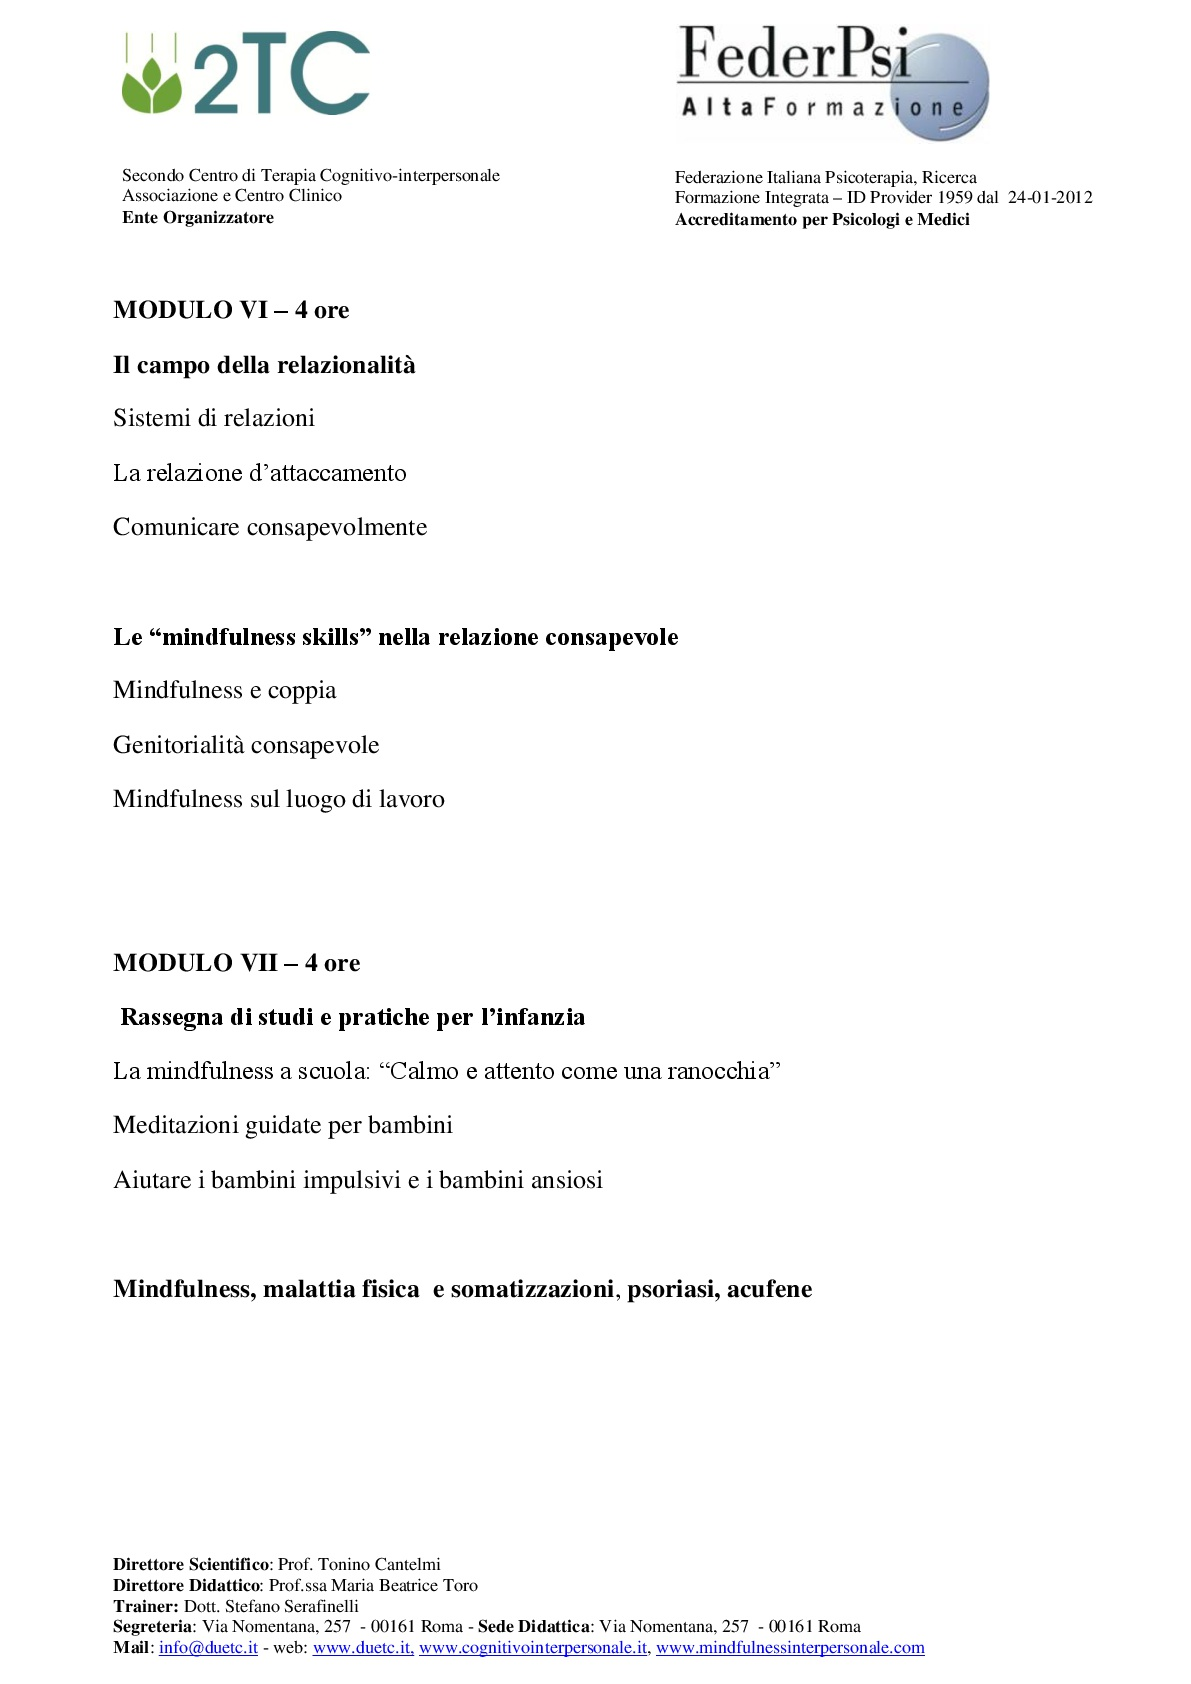 programma-Istruttore-Mindfulness-006